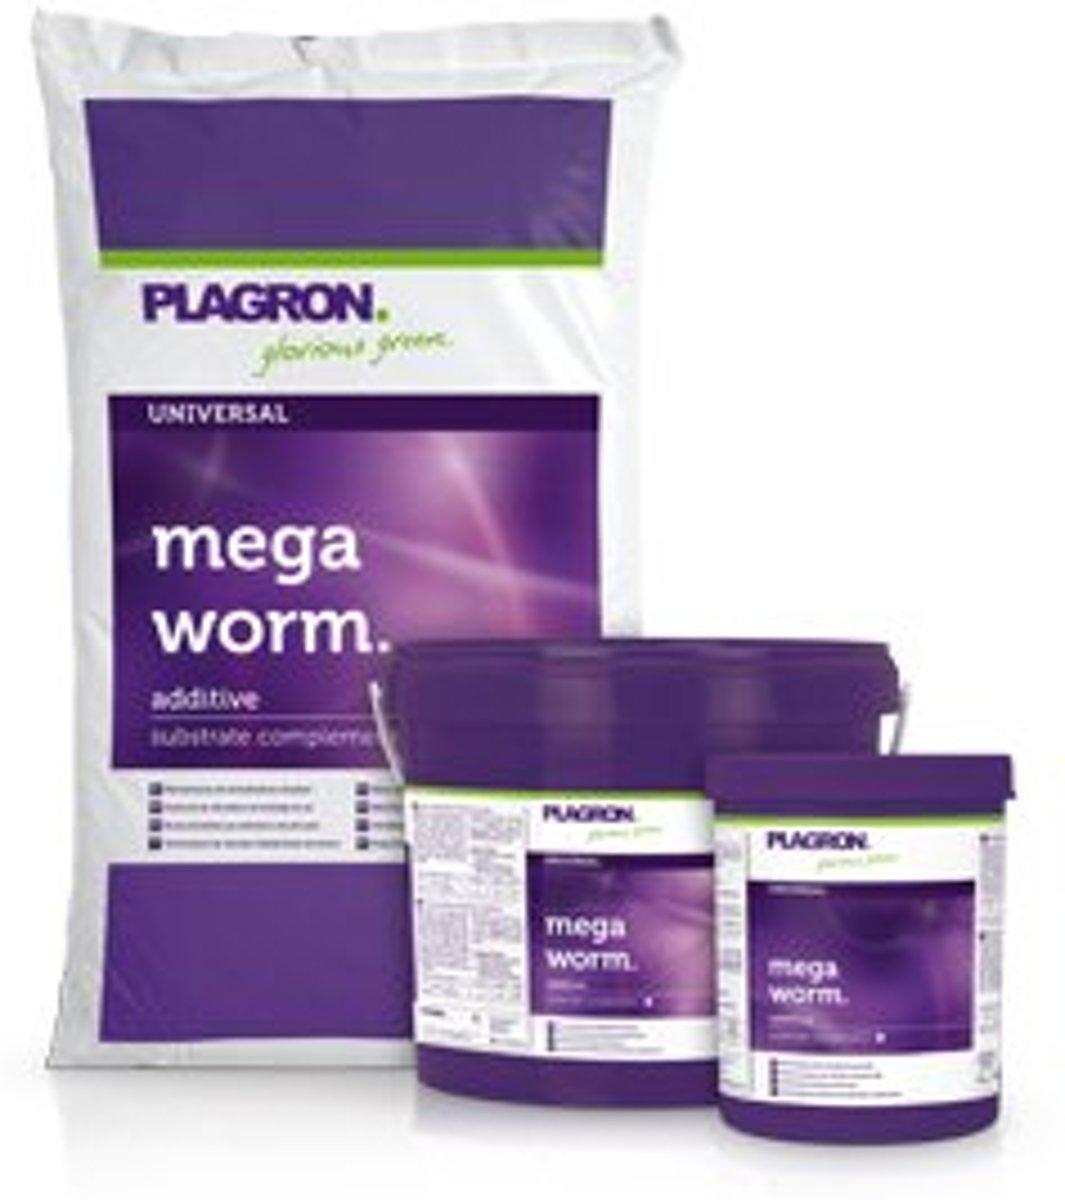 Plagron Mega Worm 25 ltr kopen